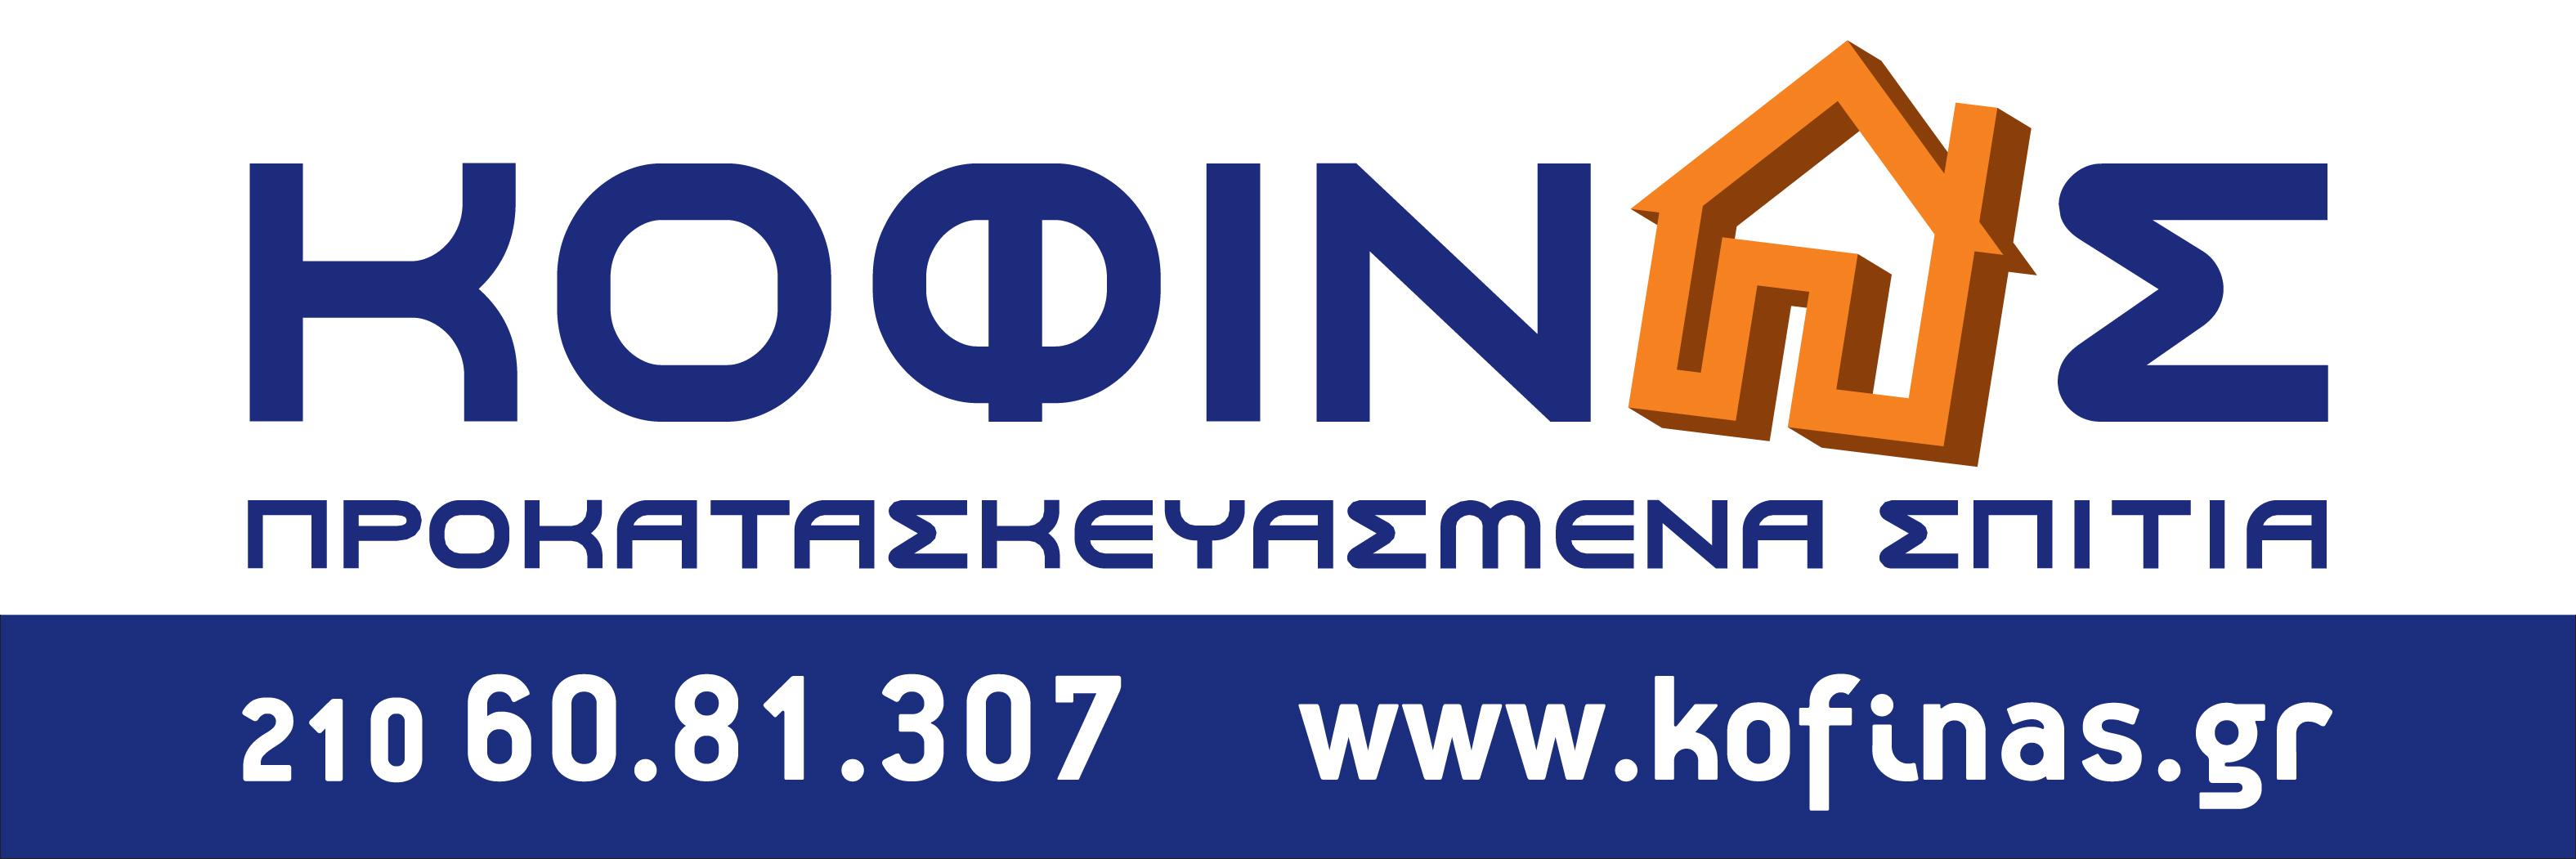 kofinas_logo_tabela